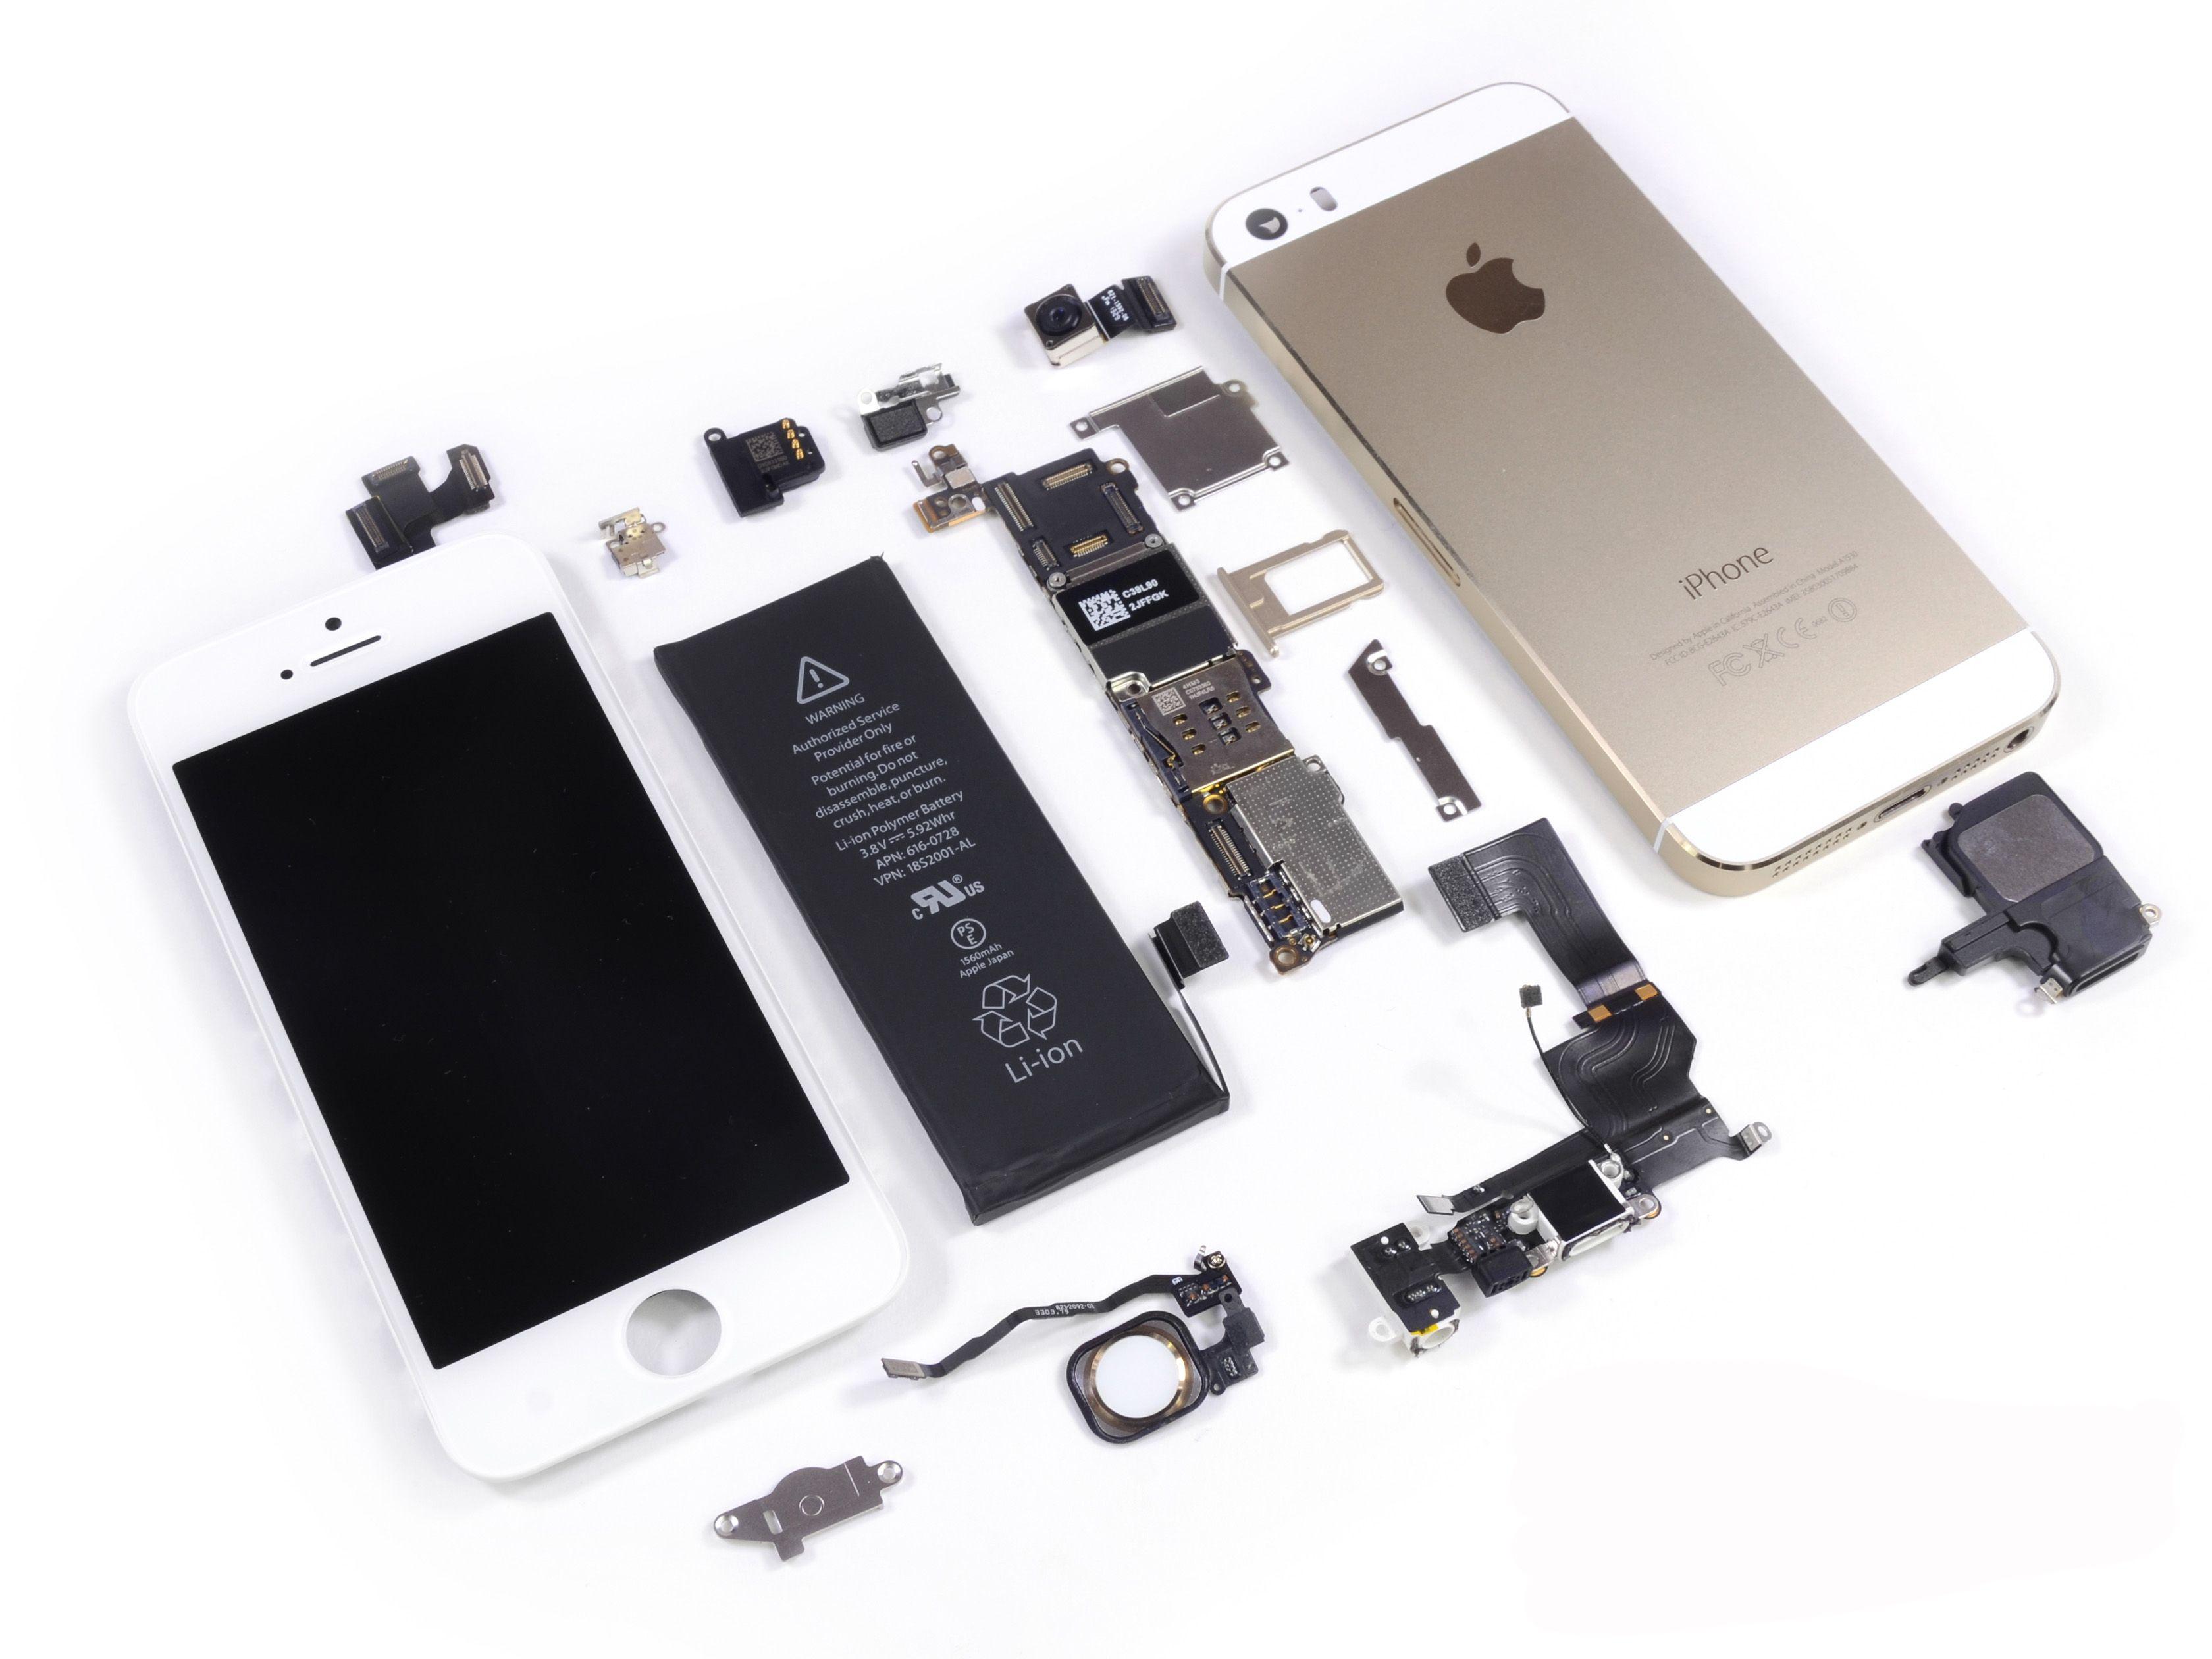 8f7ebc32dc1f282e7e7e9e9807988ec0 - What Is Vpn On Iphone 5c